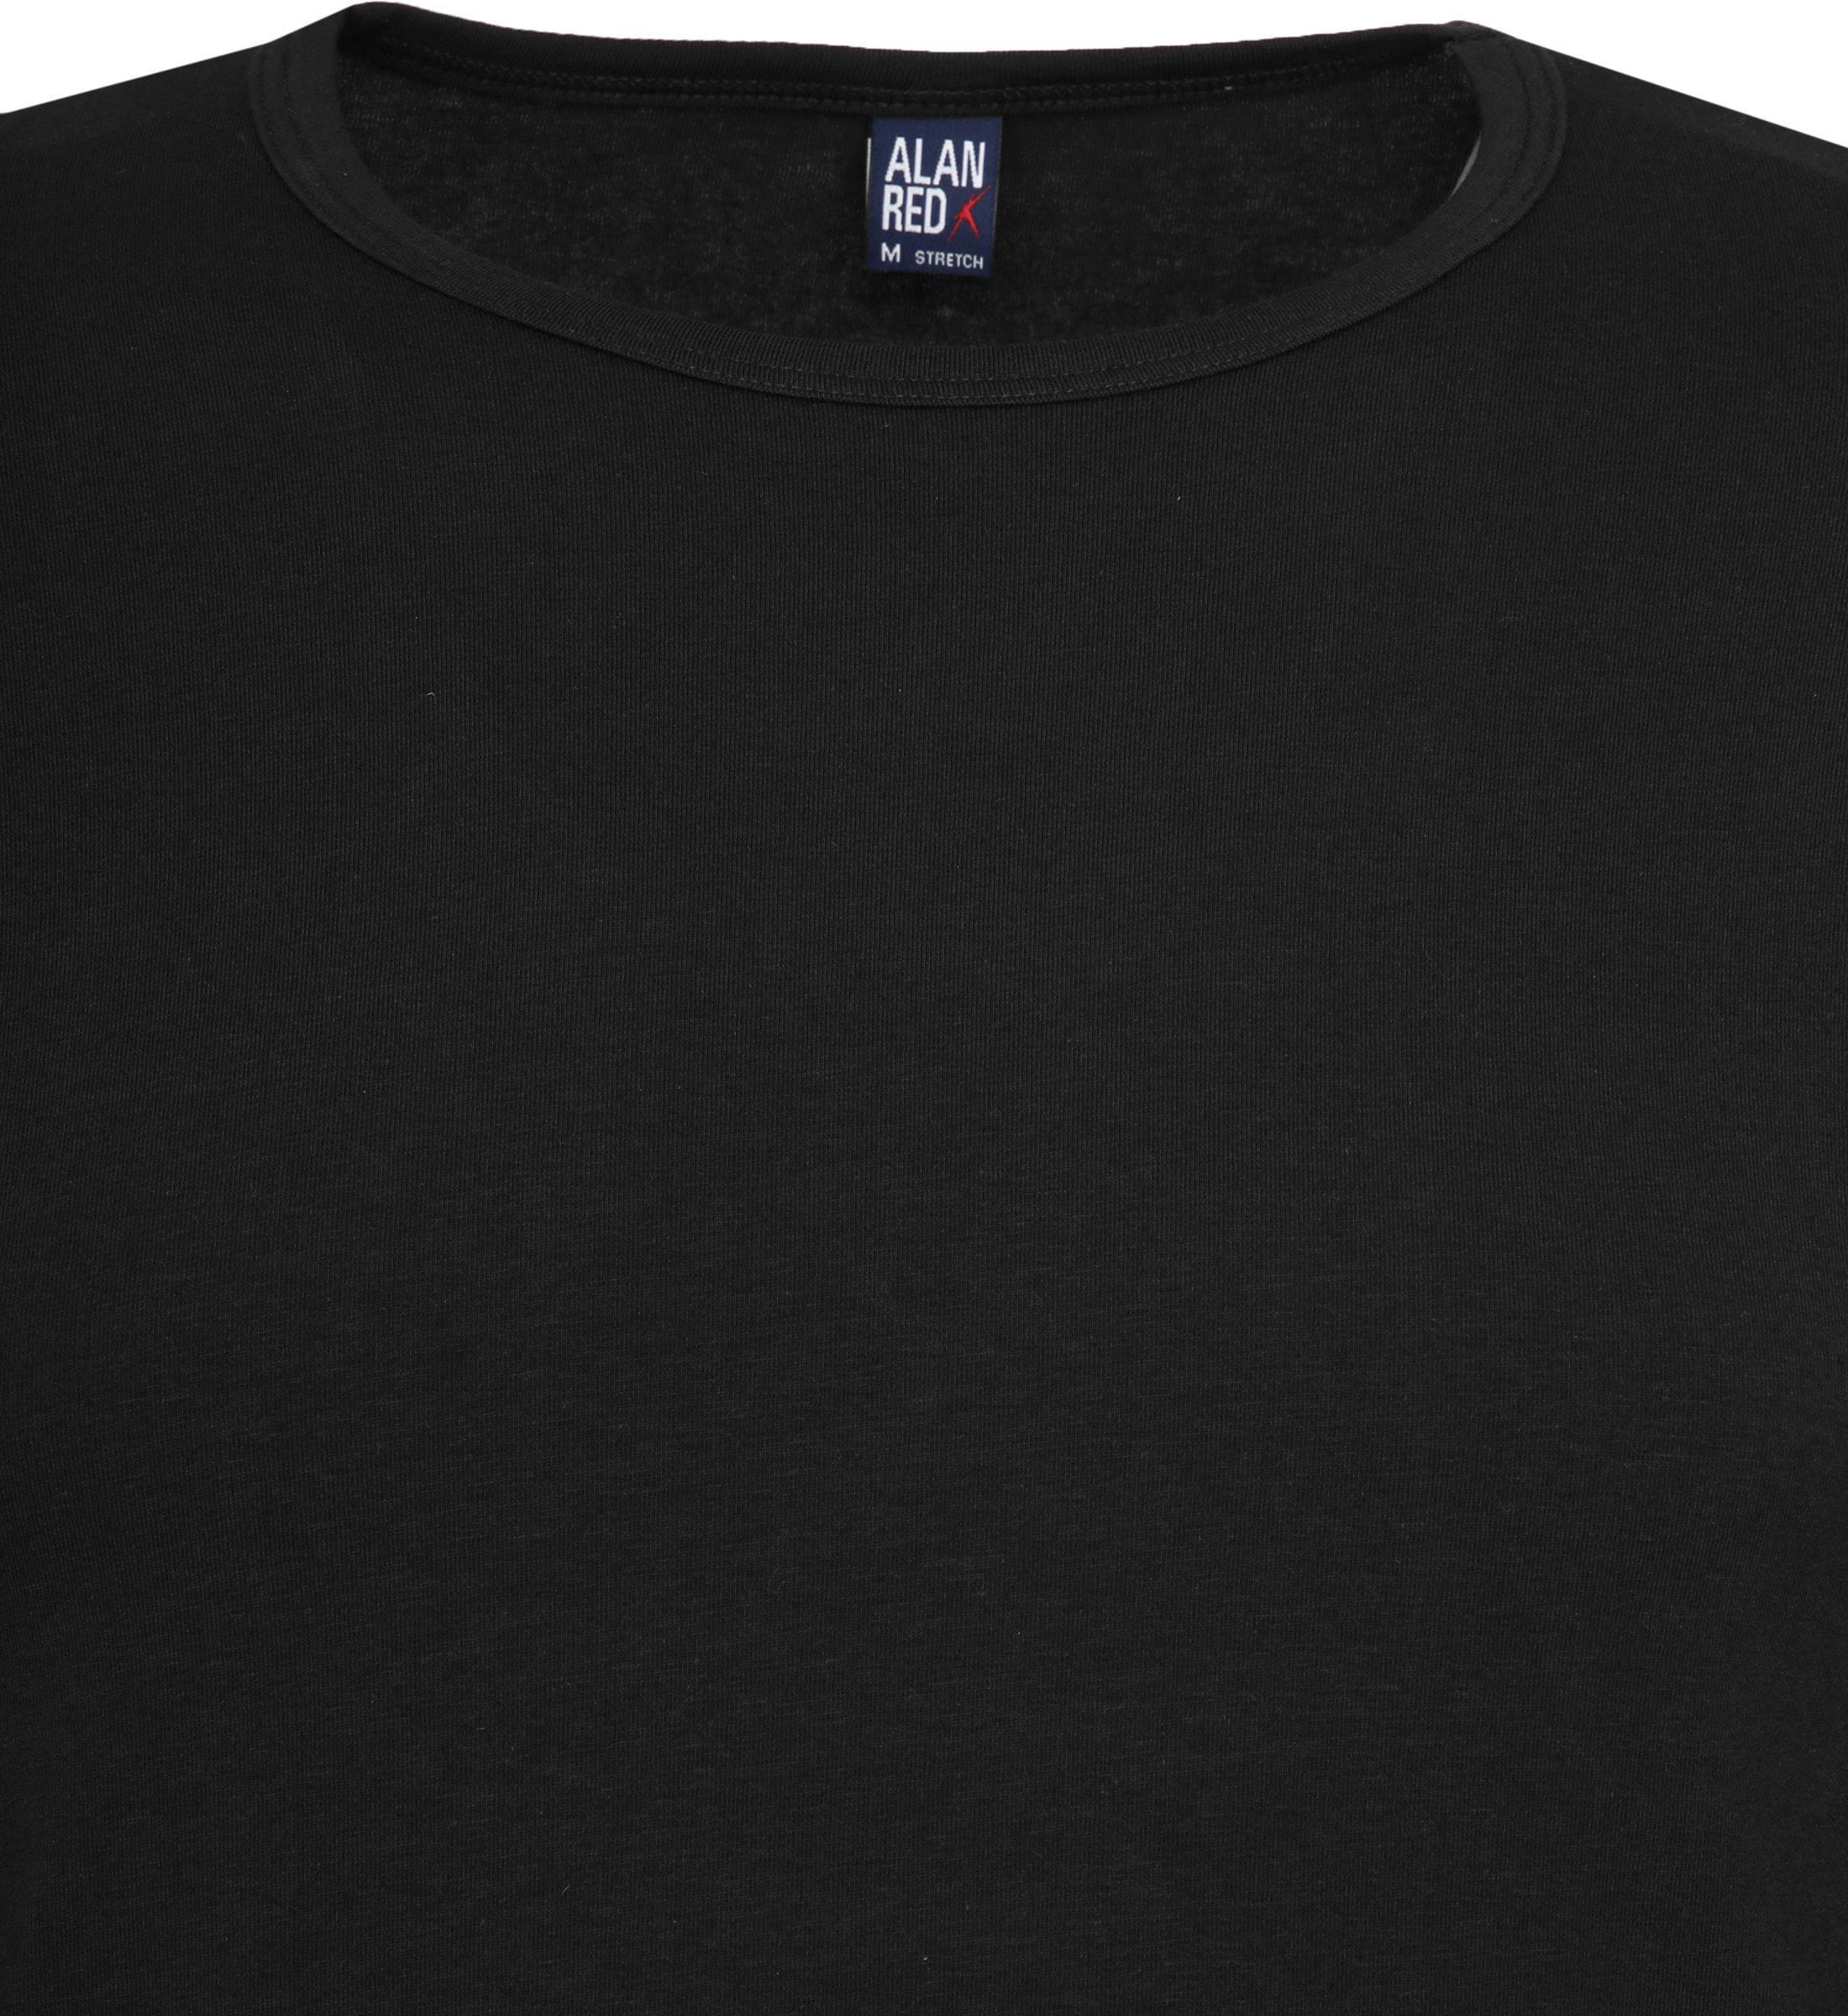 Alan Red Olbia Longsleeve T-shirt Black foto 1